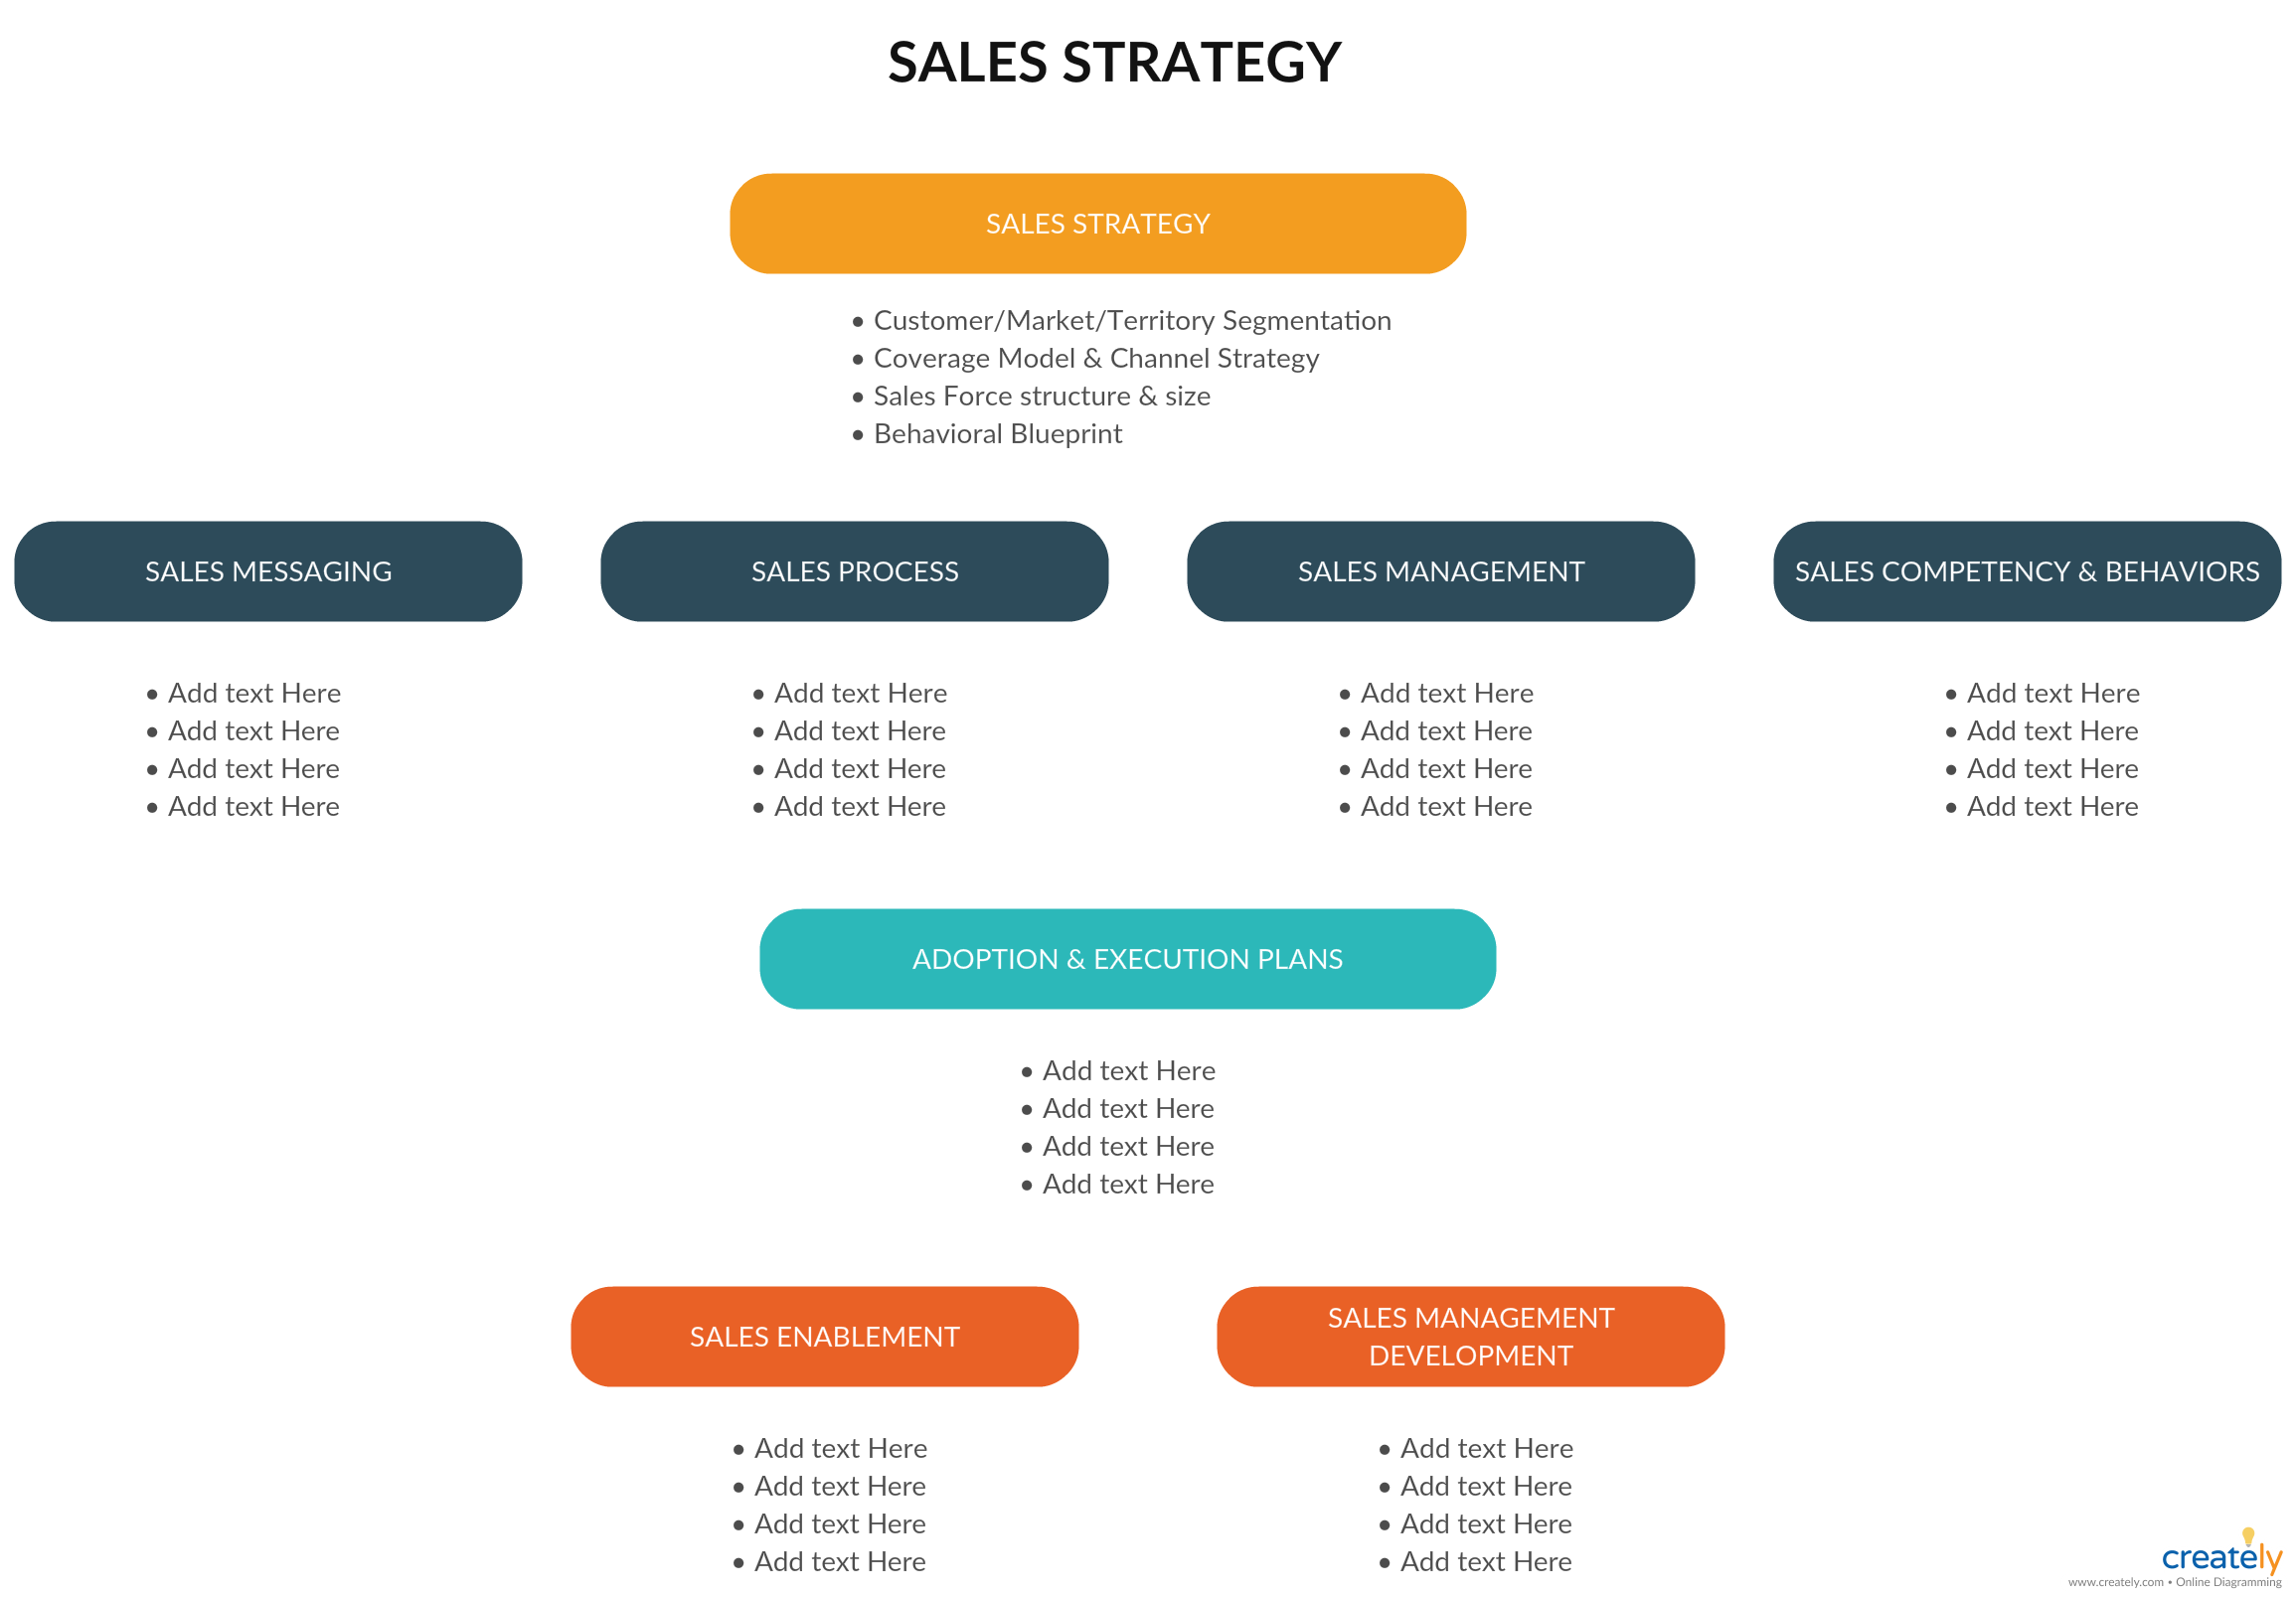 Sales Strategy Template Sales Strategy Template Sales Strategy Templates